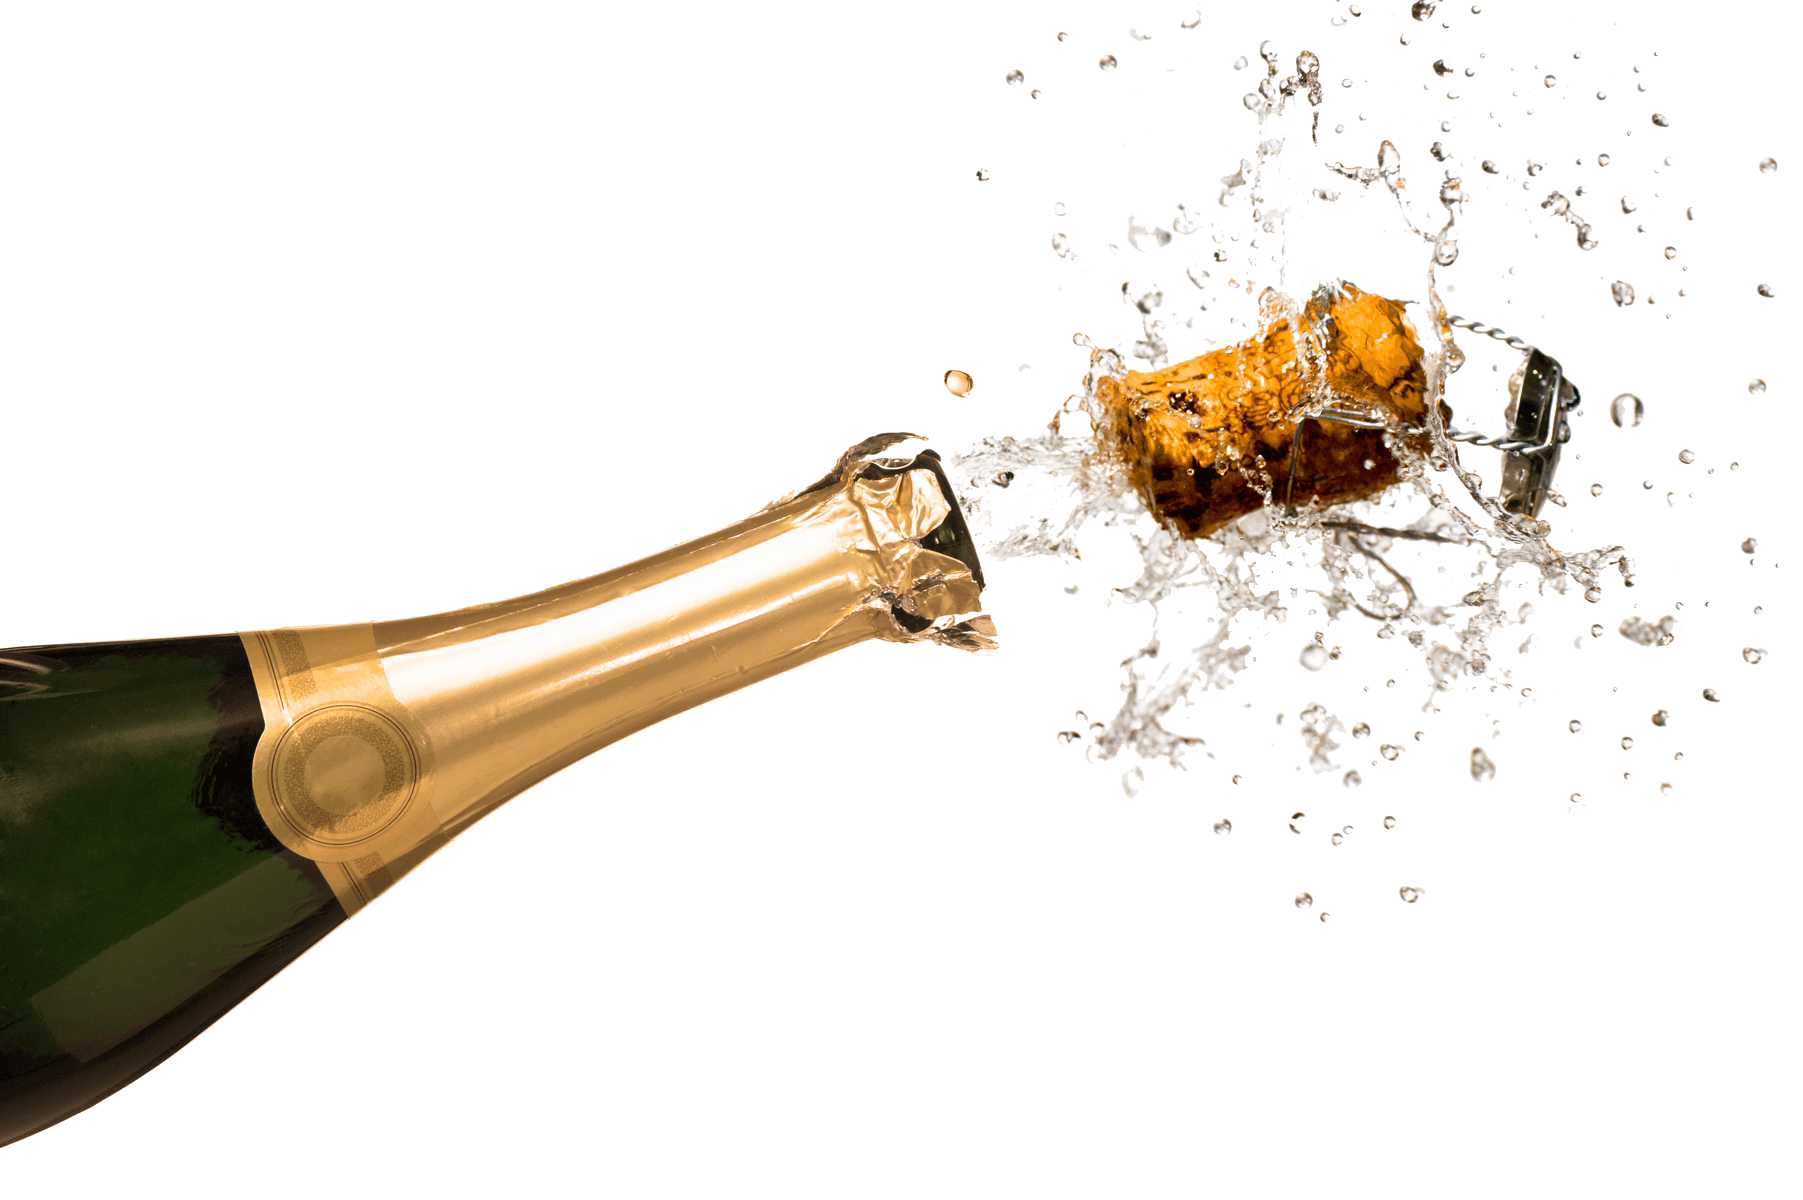 Champagne-fles-ontkurkt - Ladiesbusiness.nl